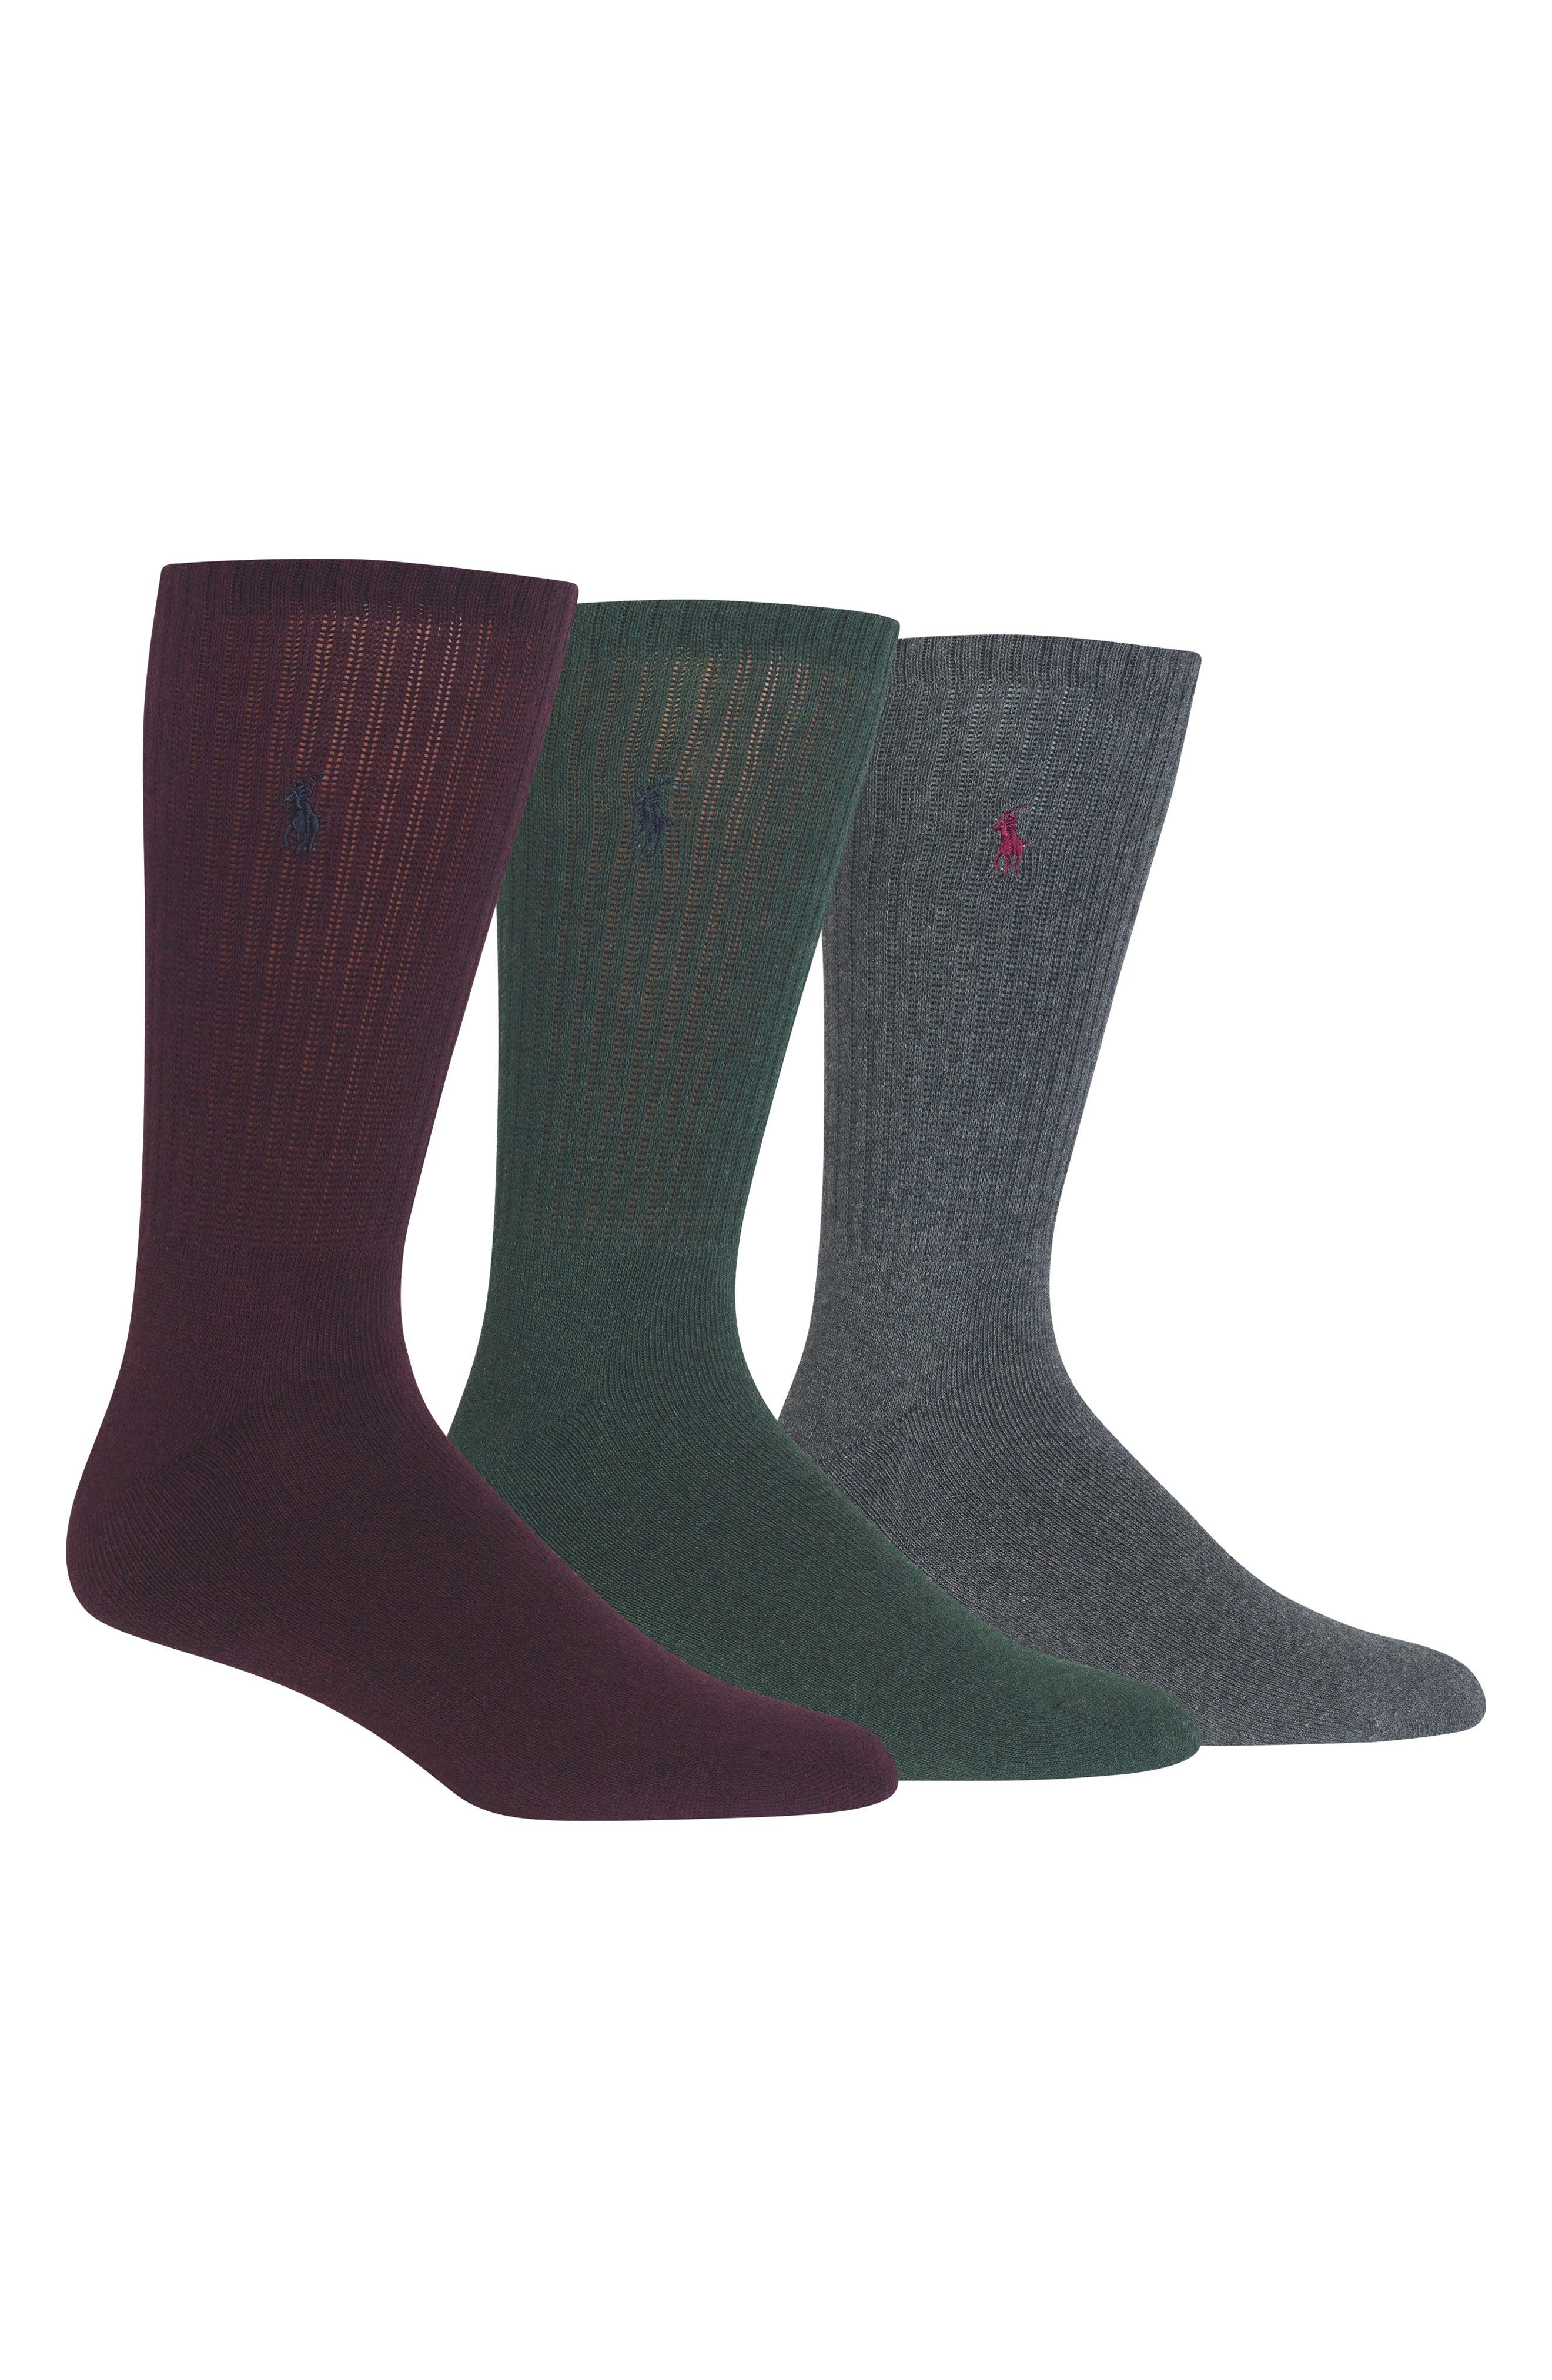 3-Pack Crew Socks,                             Main thumbnail 1, color,                             WINE